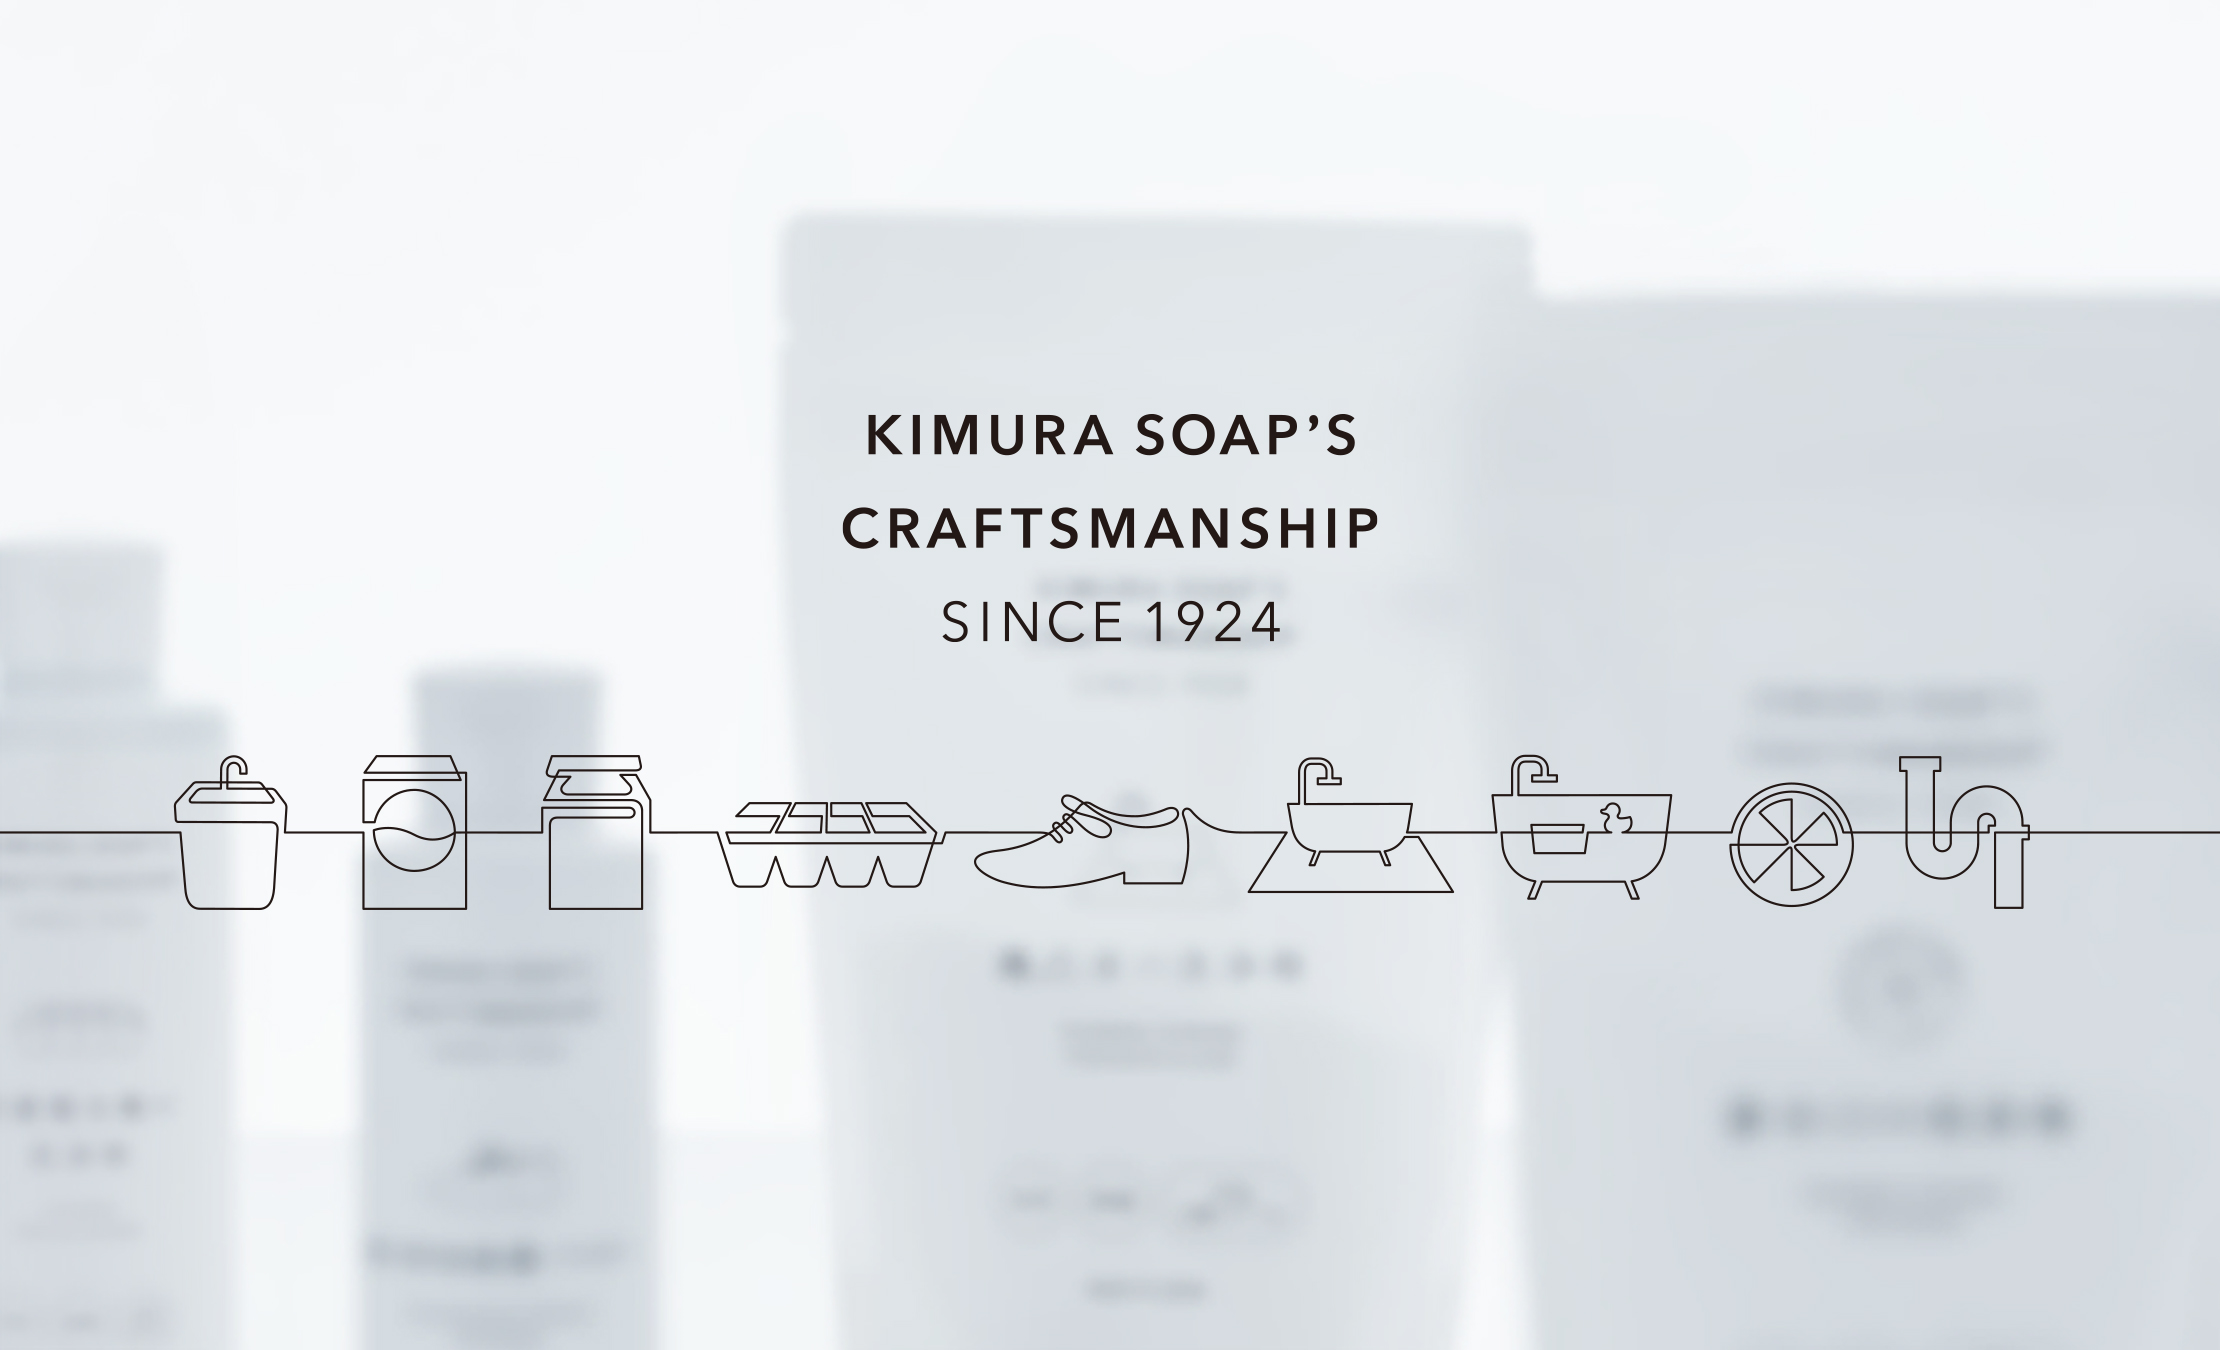 KIMURA SOAP'S CRAFTSMANSHIP SINCE1924